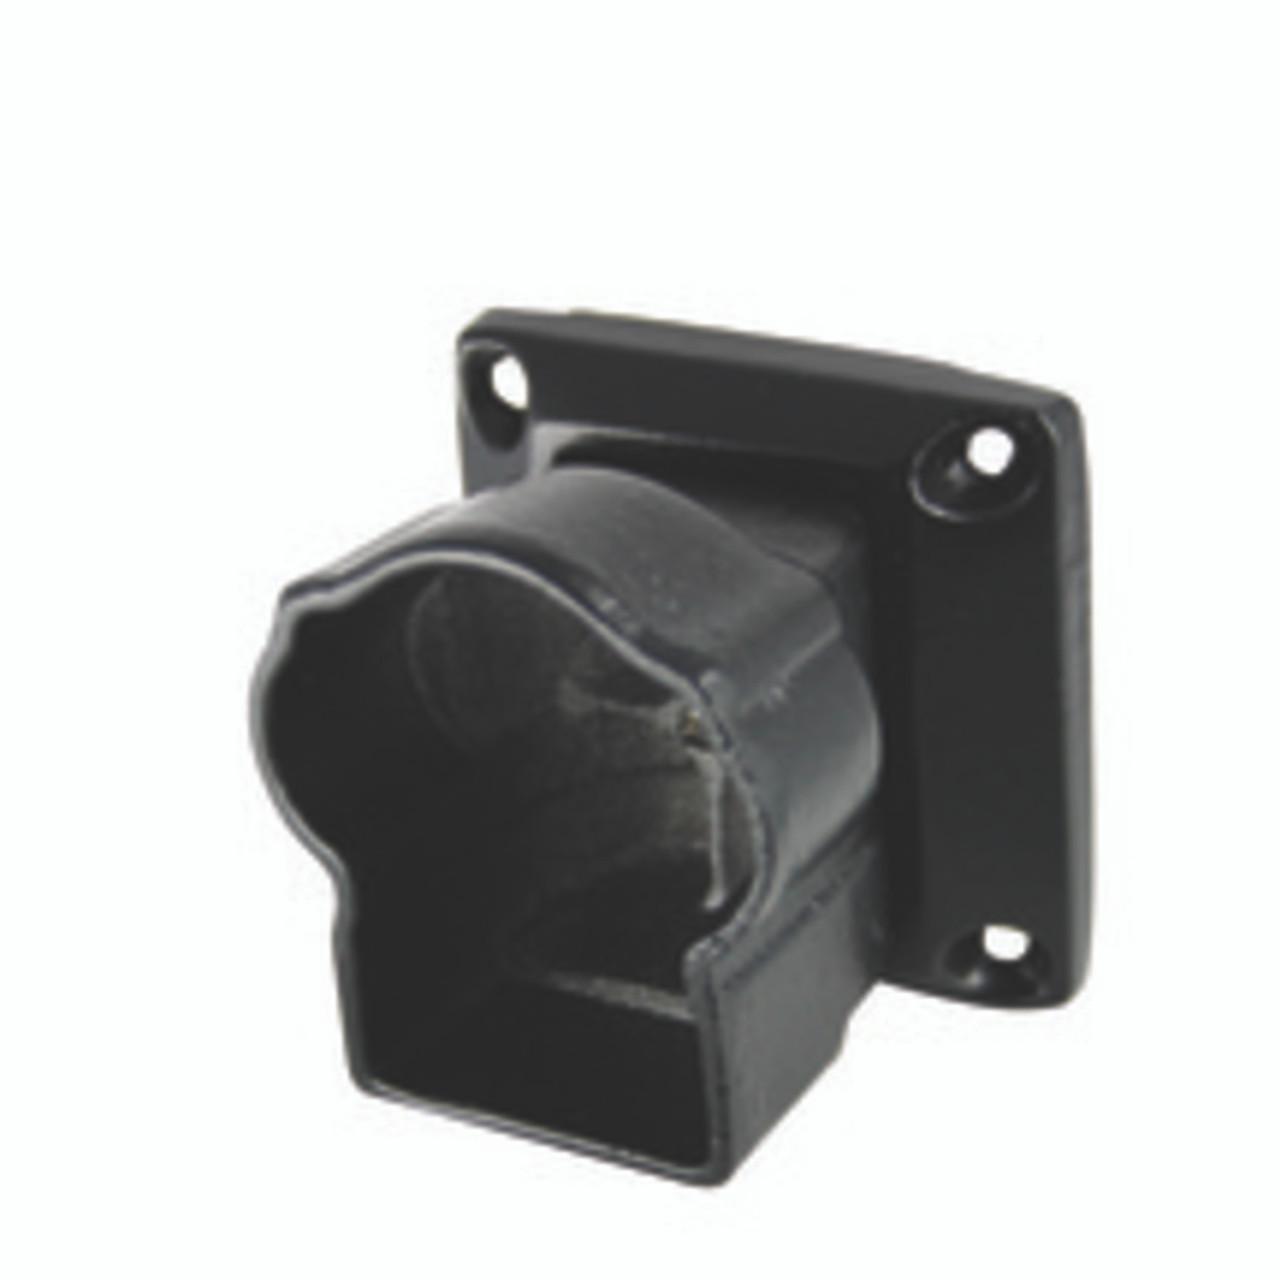 Key-Link Arabian Series Top Swivel Bracket - Black